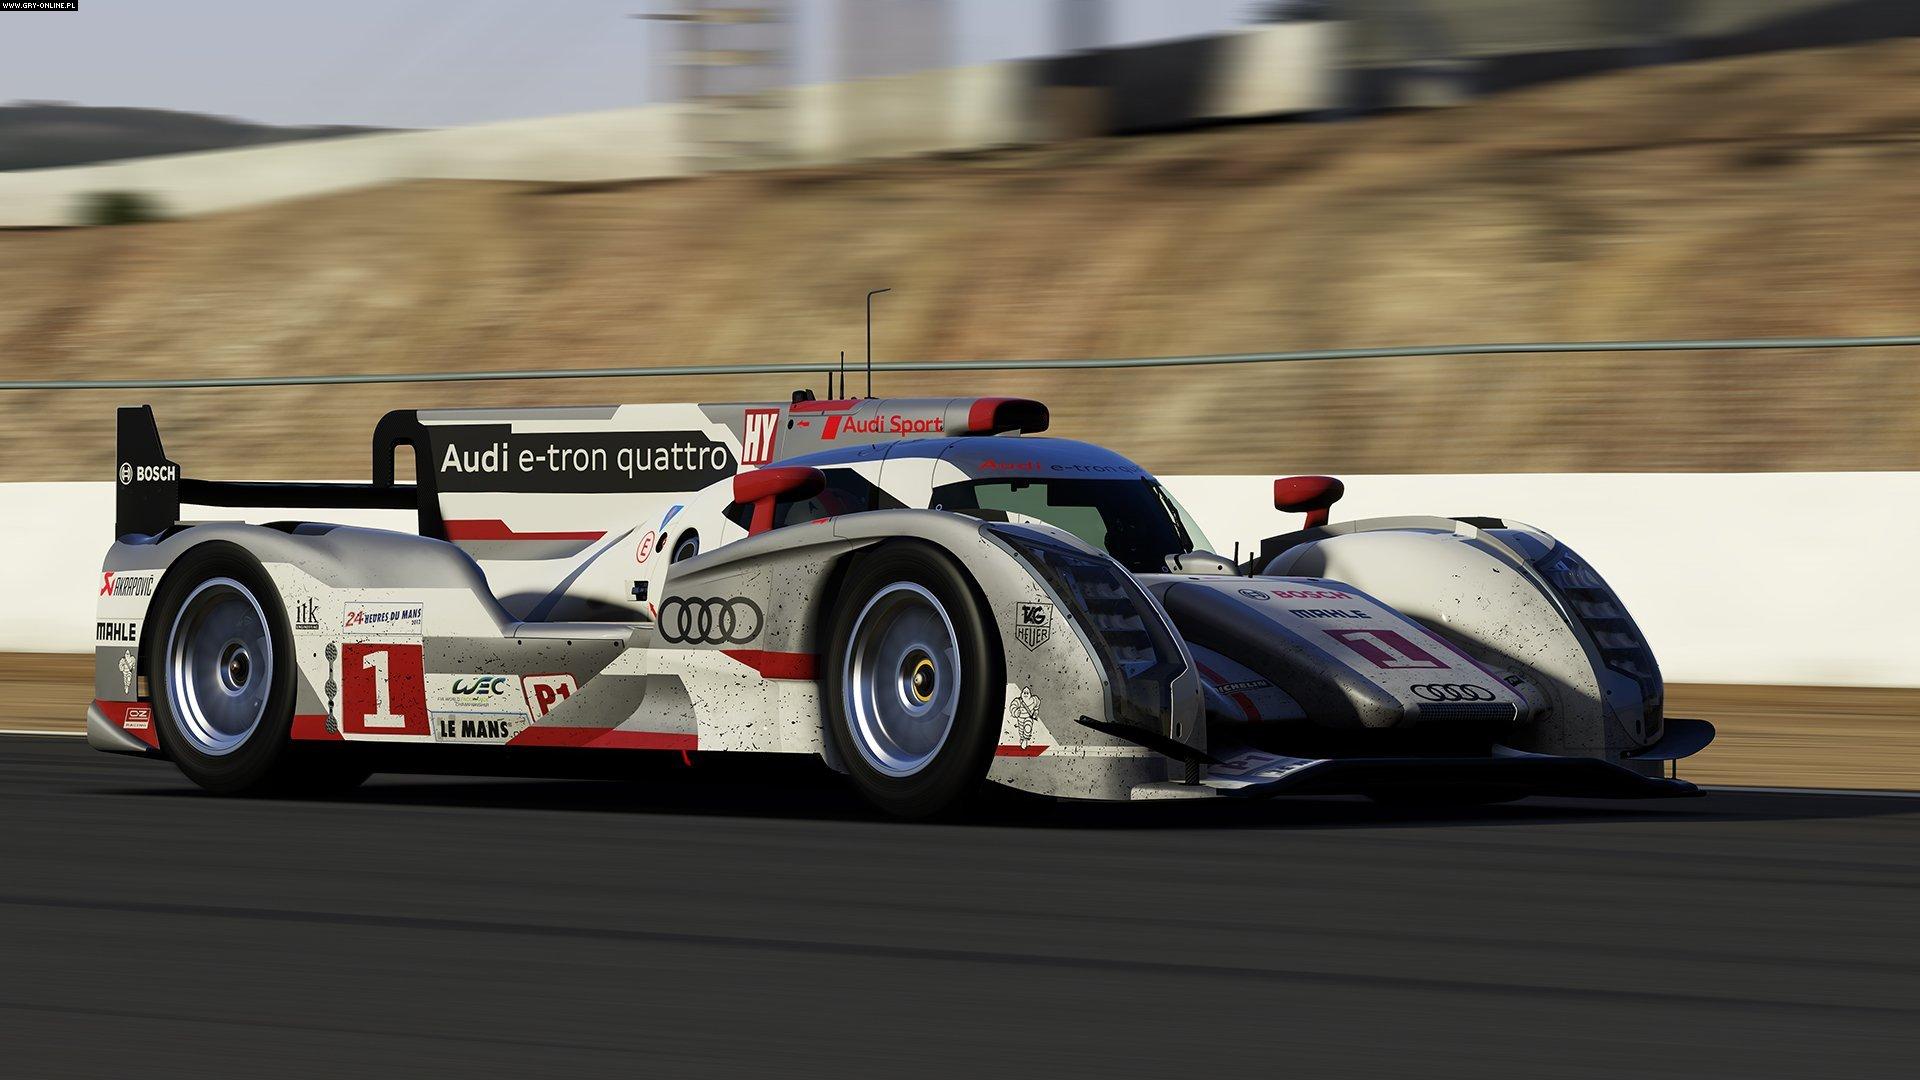 Video Game   Forza Motorsport 5 Wallpaper 1920x1080